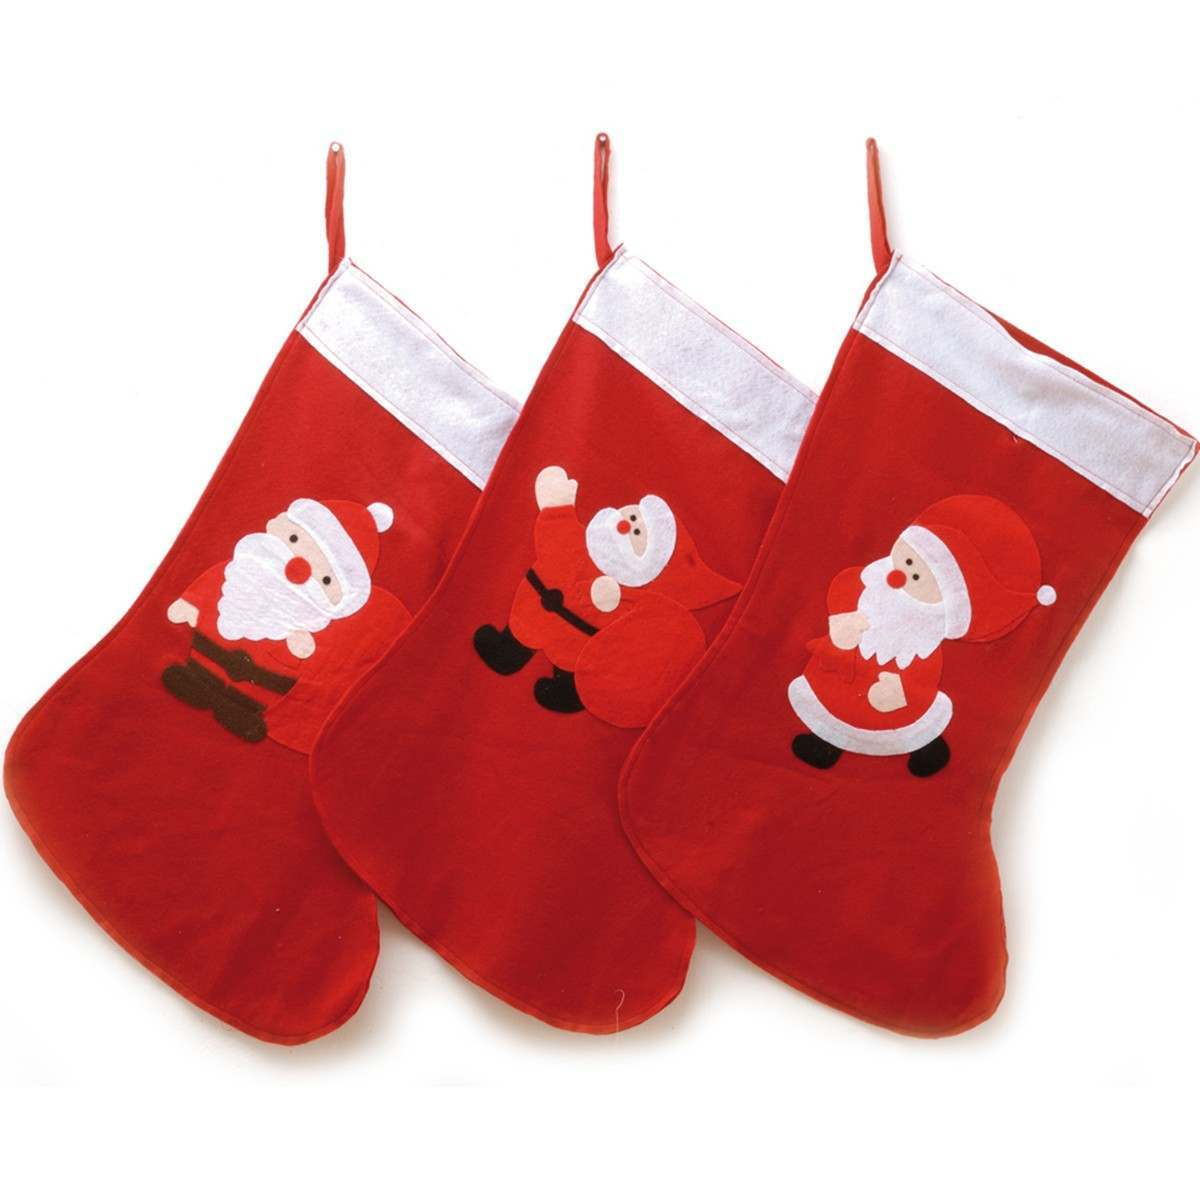 Red and White Santa Stocking